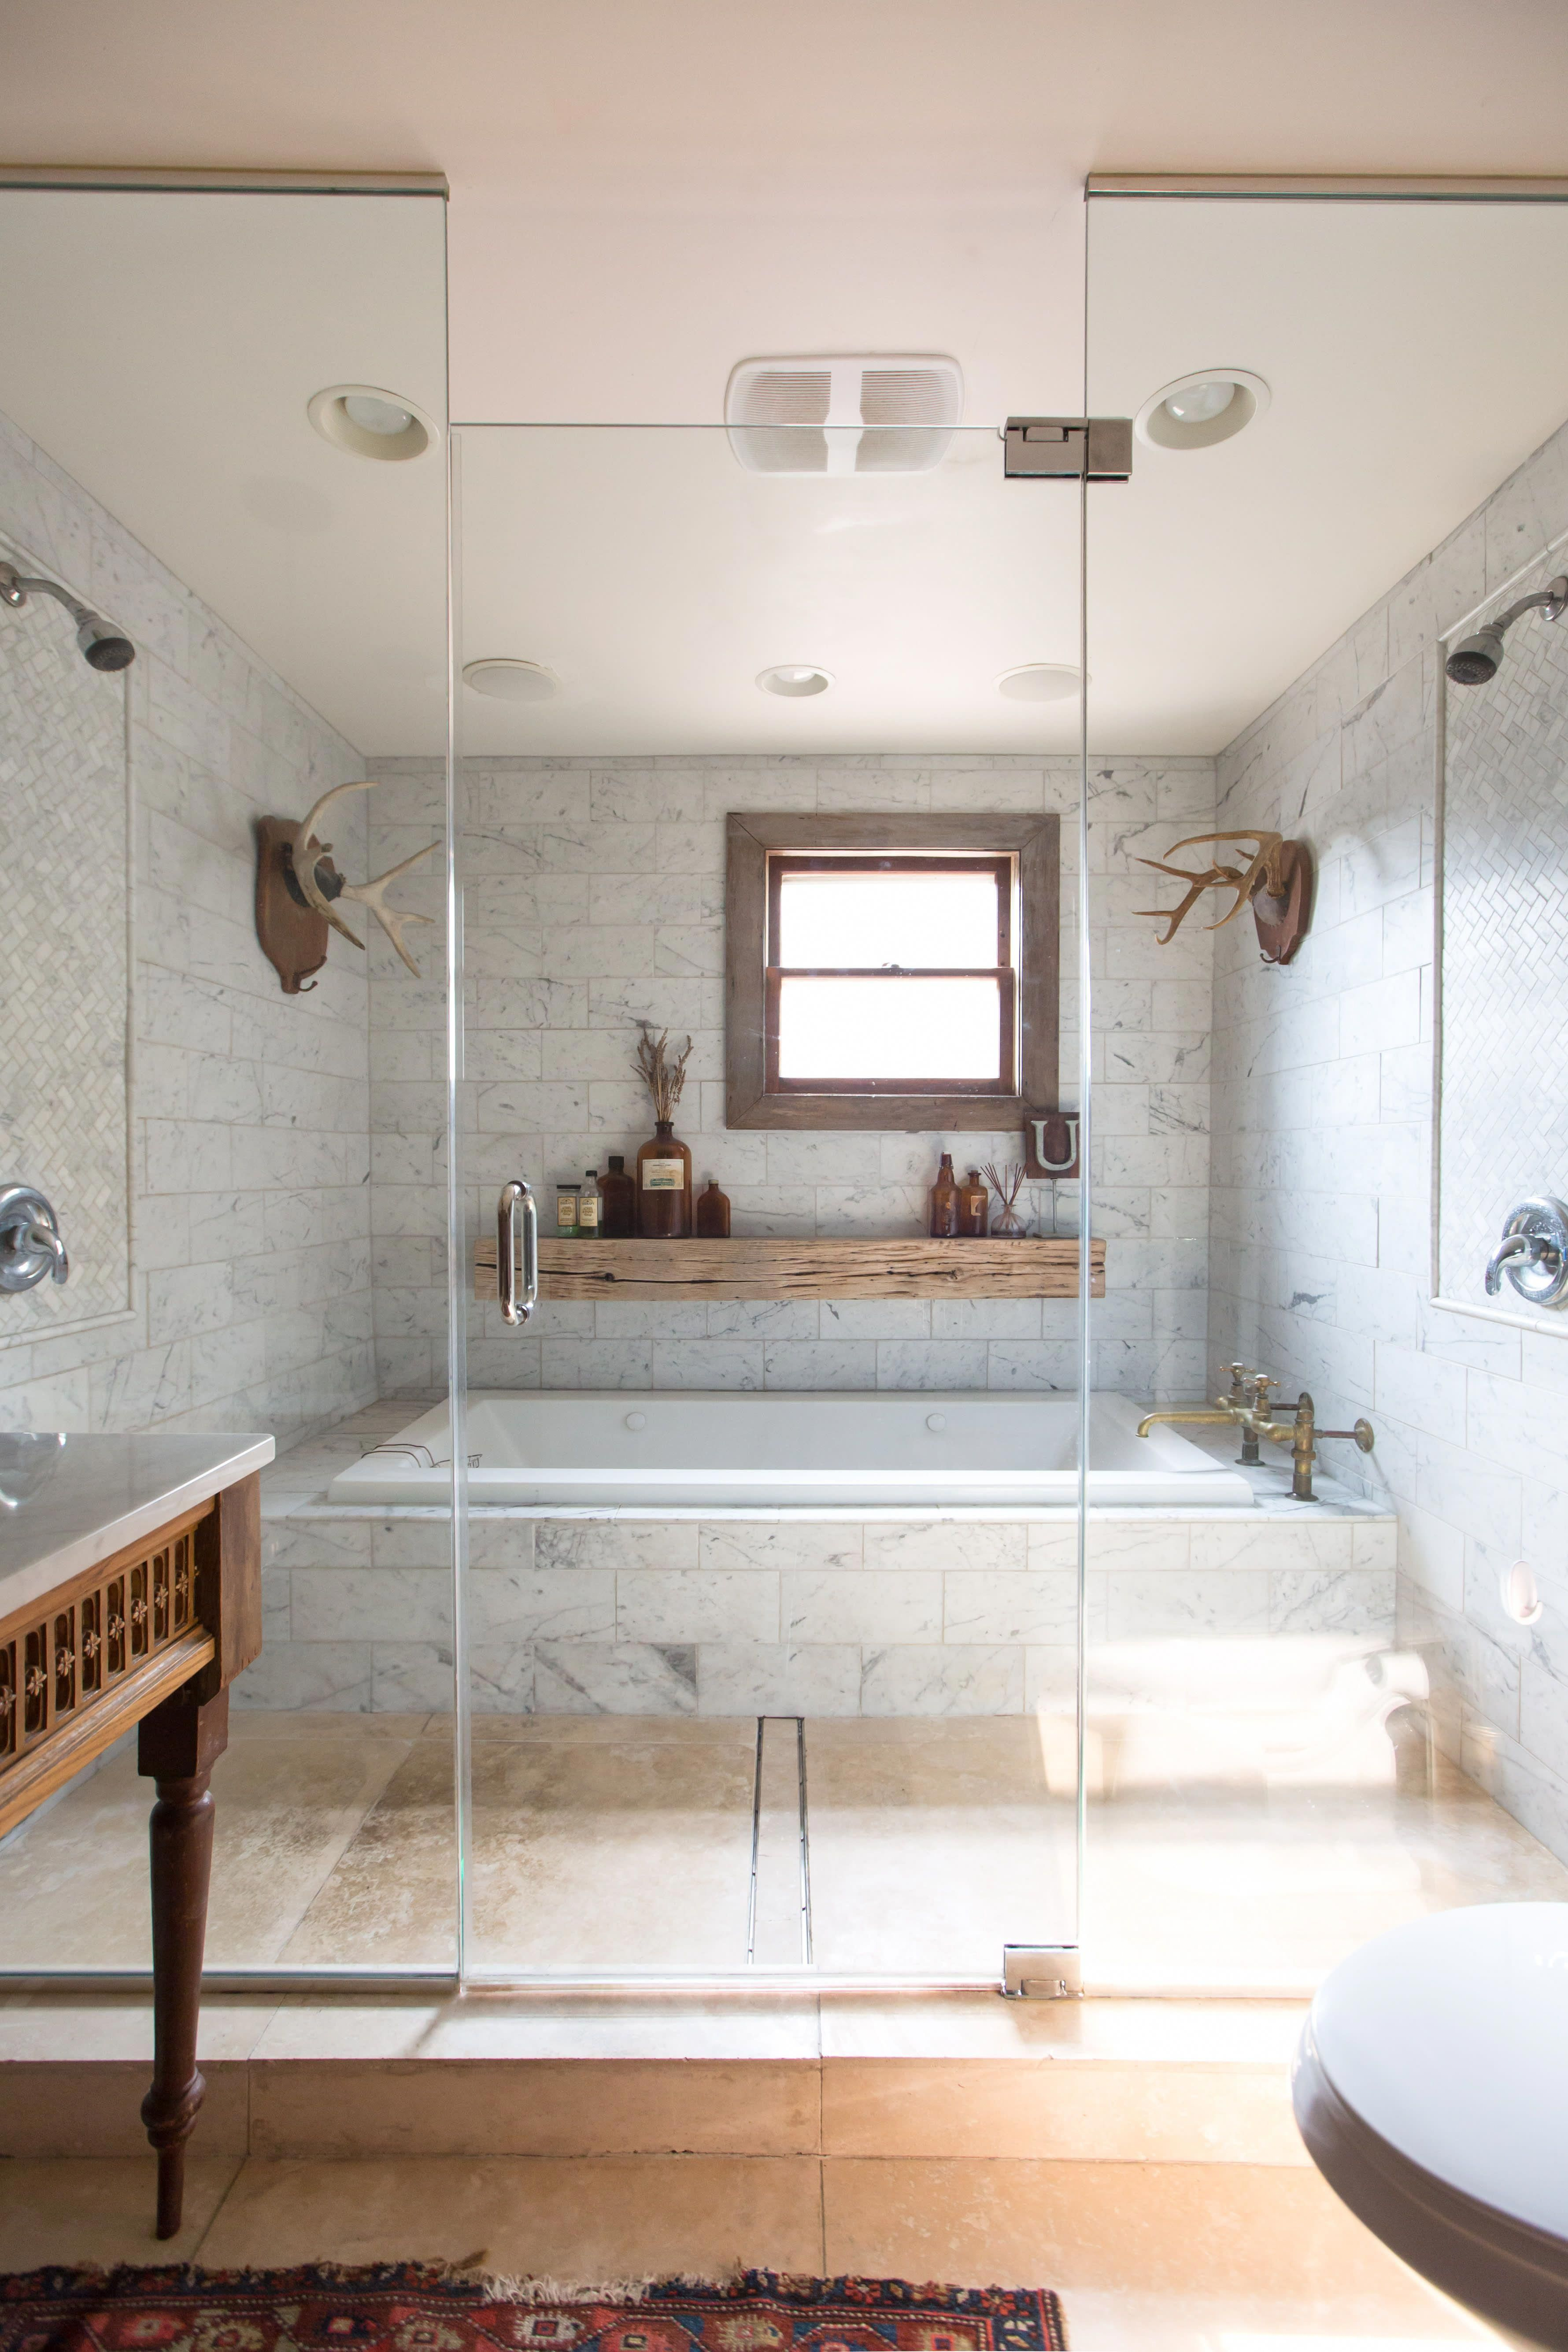 This Scandi Inspired Farmhouse Is Cooler Than Anything You Ve Seen On Fixer Upper Modernbathro Small Bathroom Remodel Bathroom Interior Modern Bathroom Design